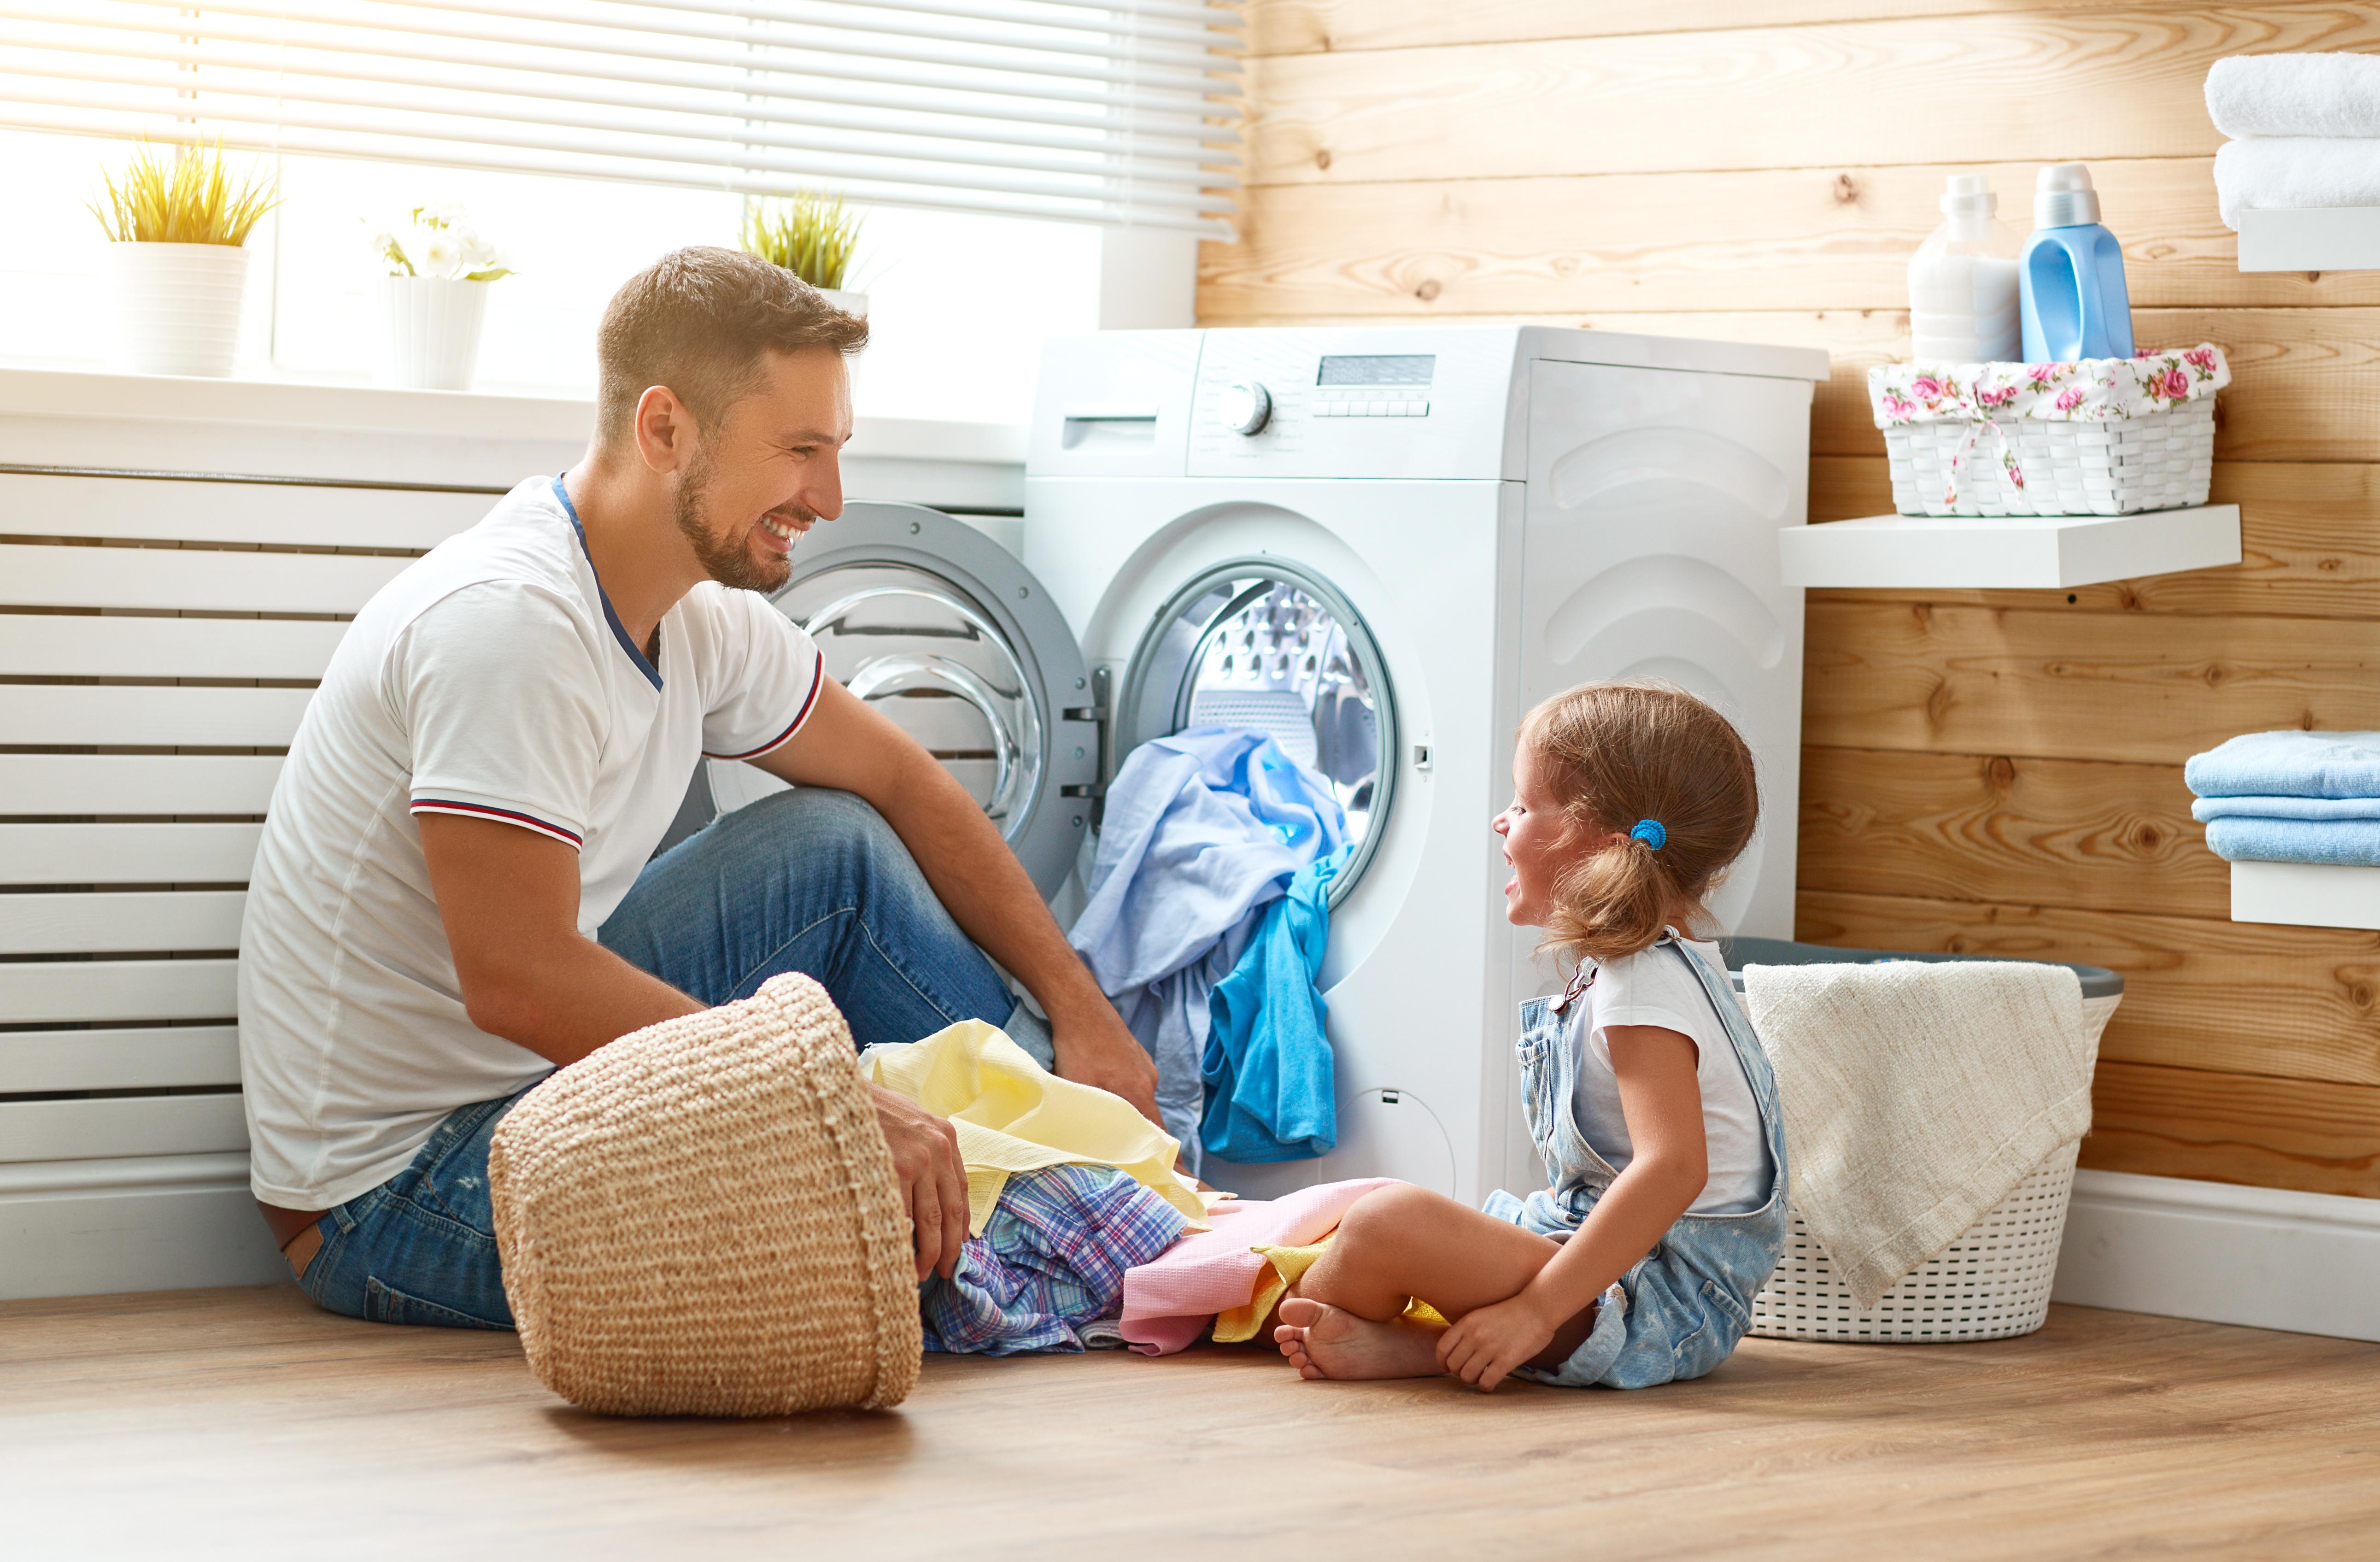 Tehokas pyykinpesunurkkaus